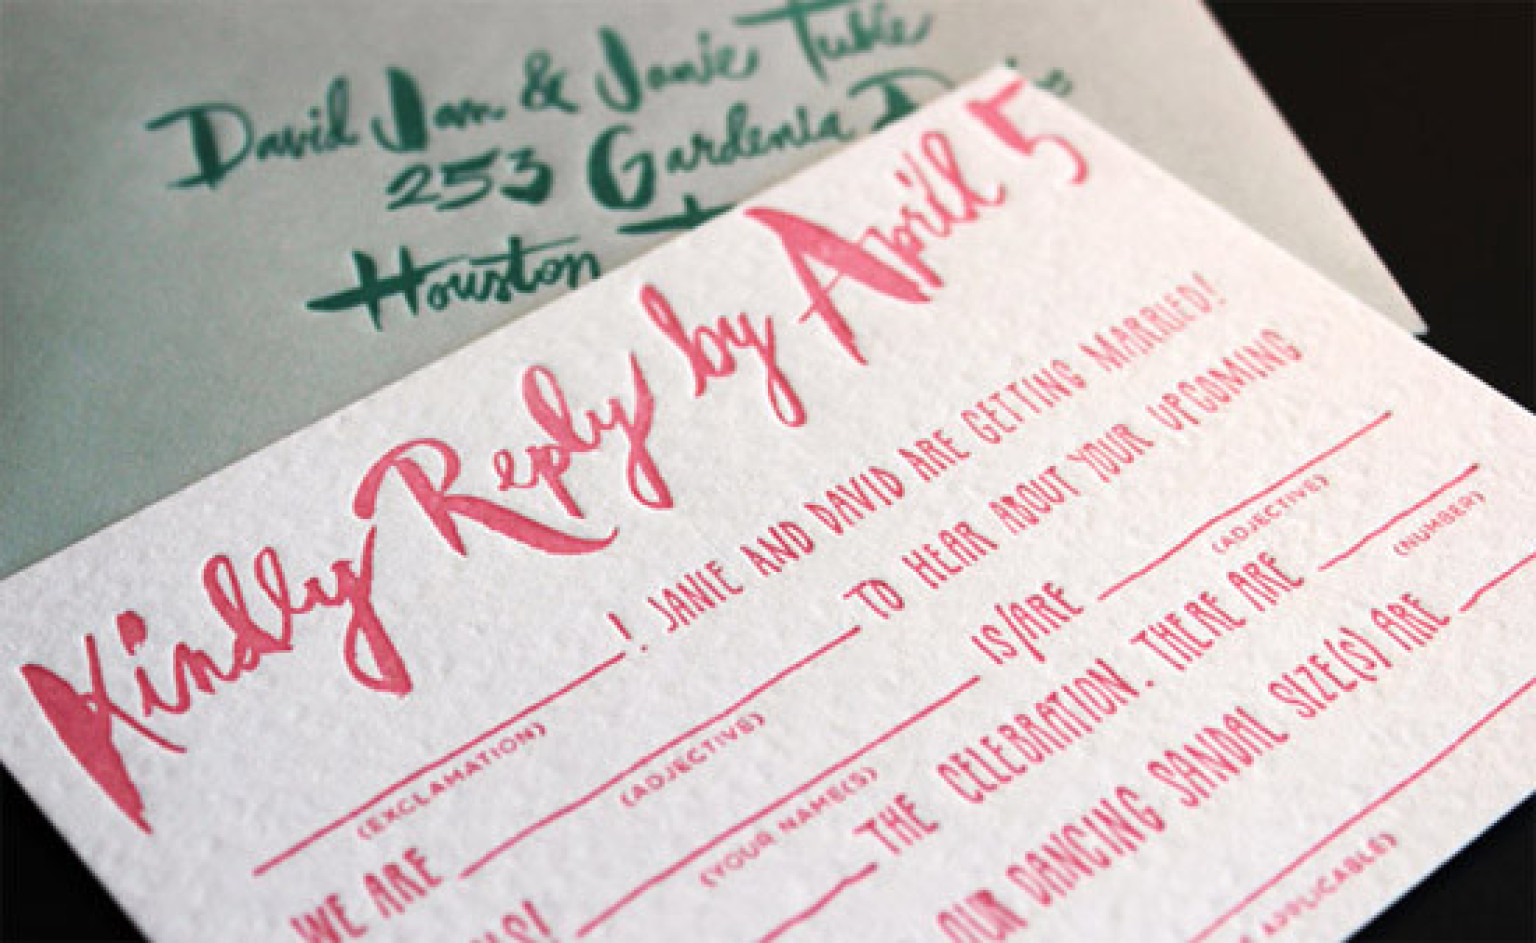 Cushty Guests Mad Libs Wedding Ideas Huffpost Wedding Rsvp Card Wording Website Wedding Rsvp Card Wording Number inspiration Wedding Rsvp Card Wording